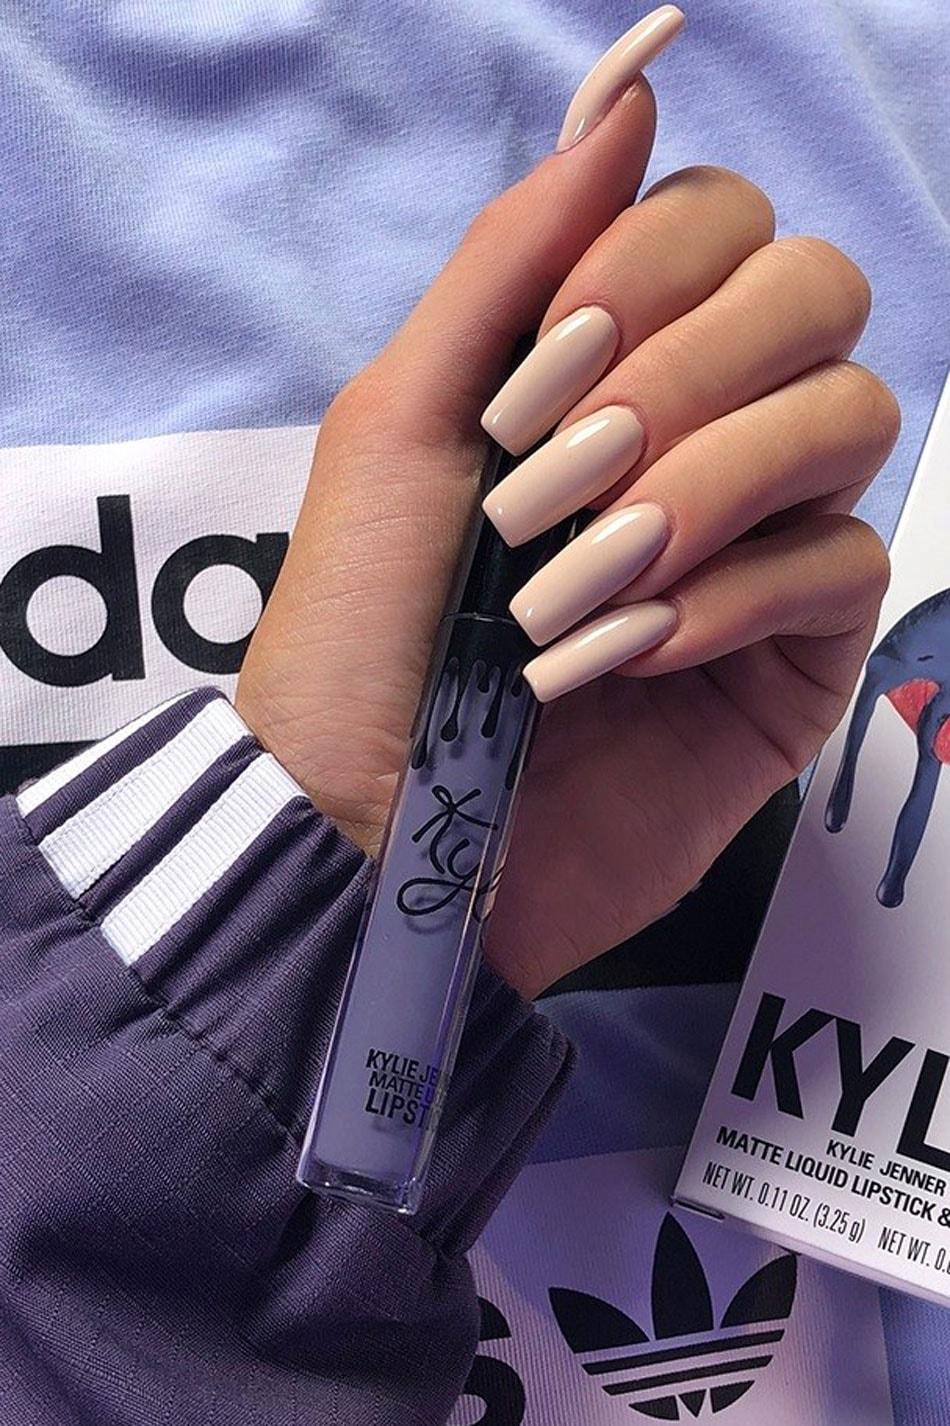 Image result for kylie jenner adidas lip kit